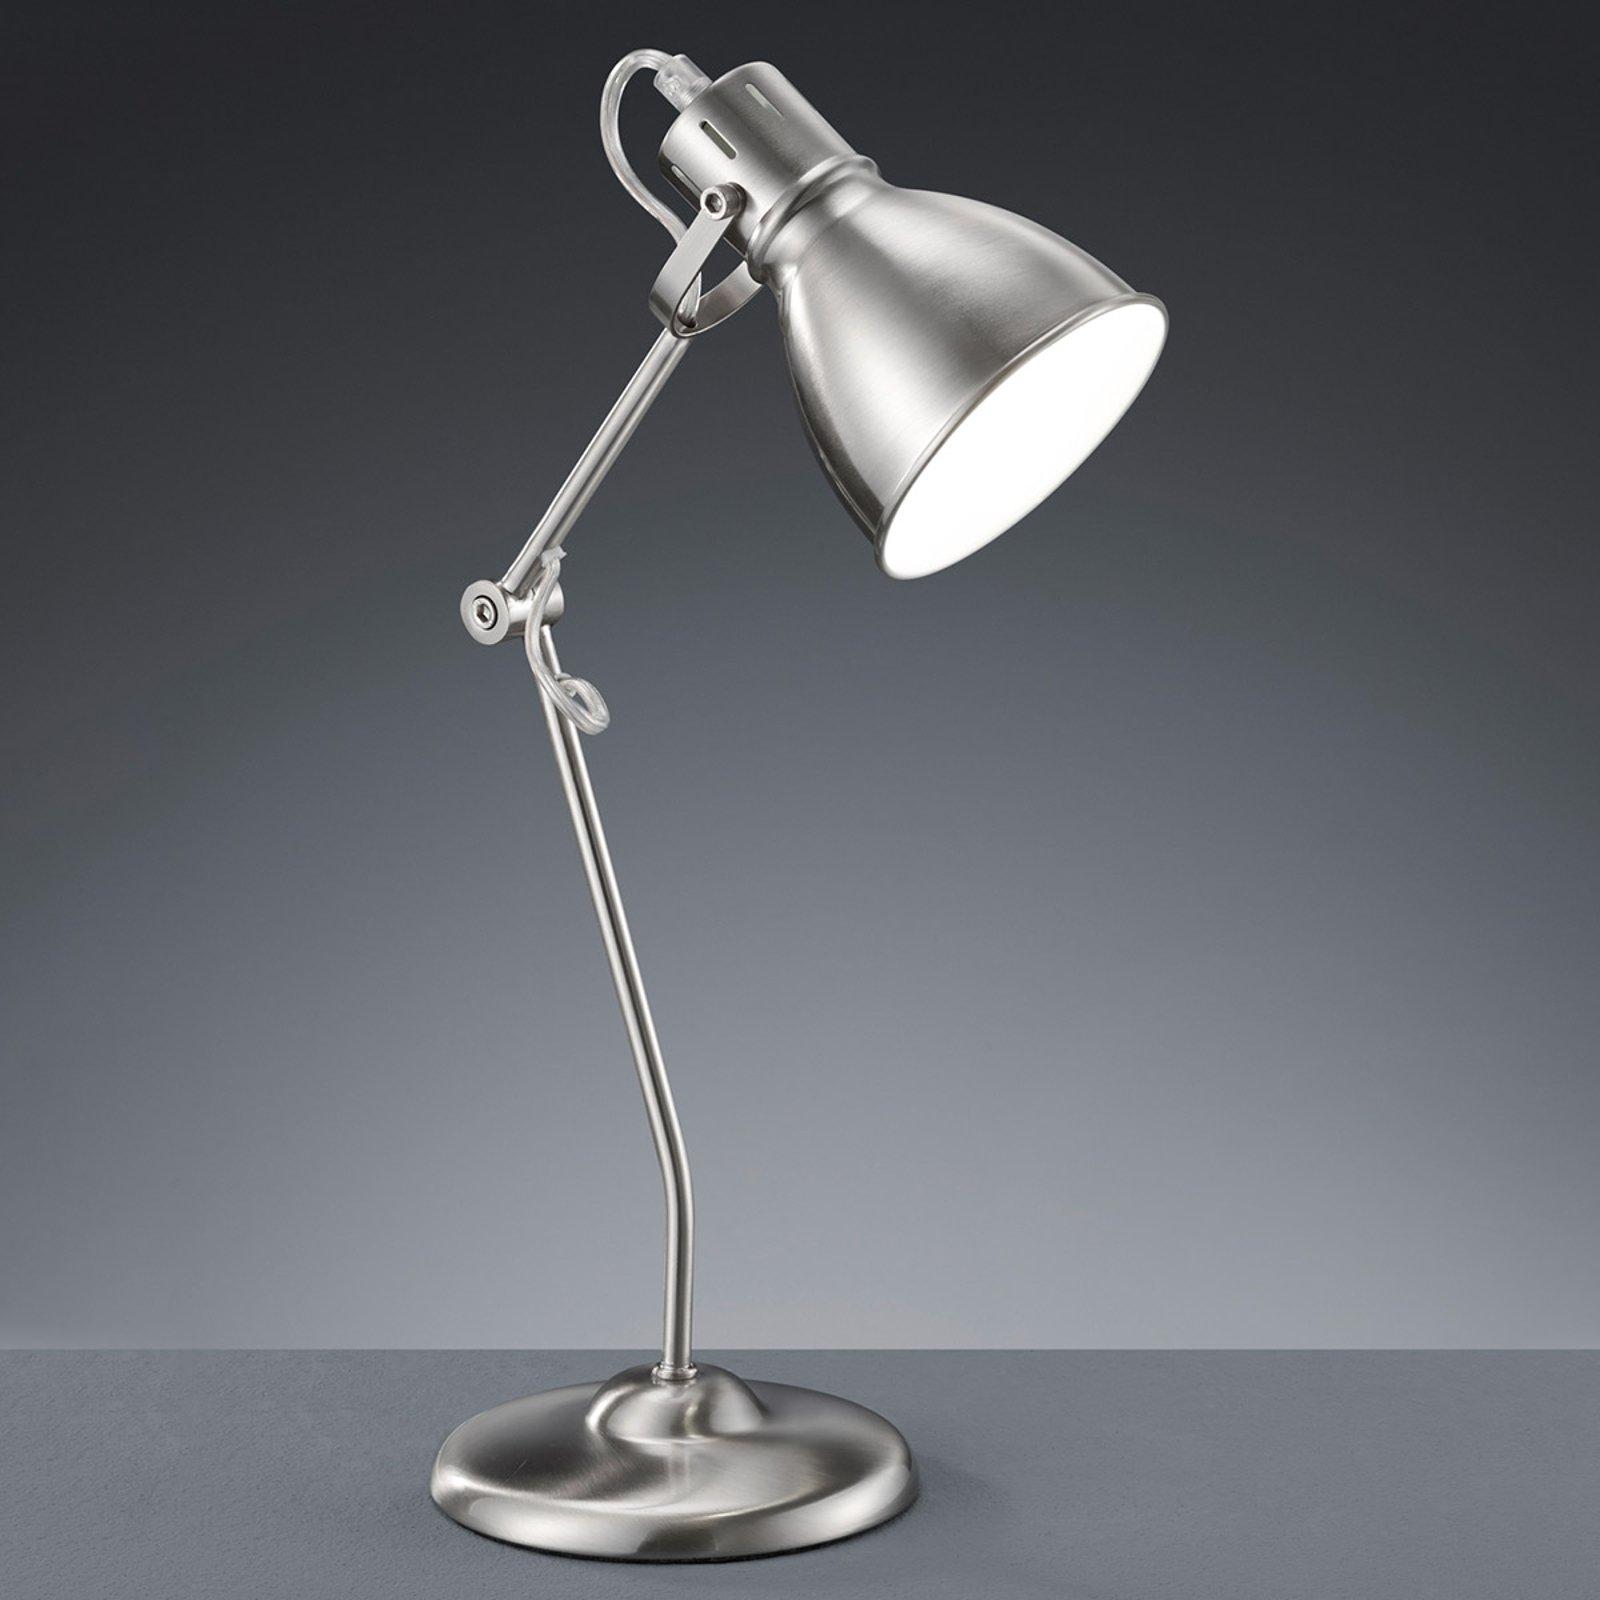 Liten bordlampe Keali nikkel matt